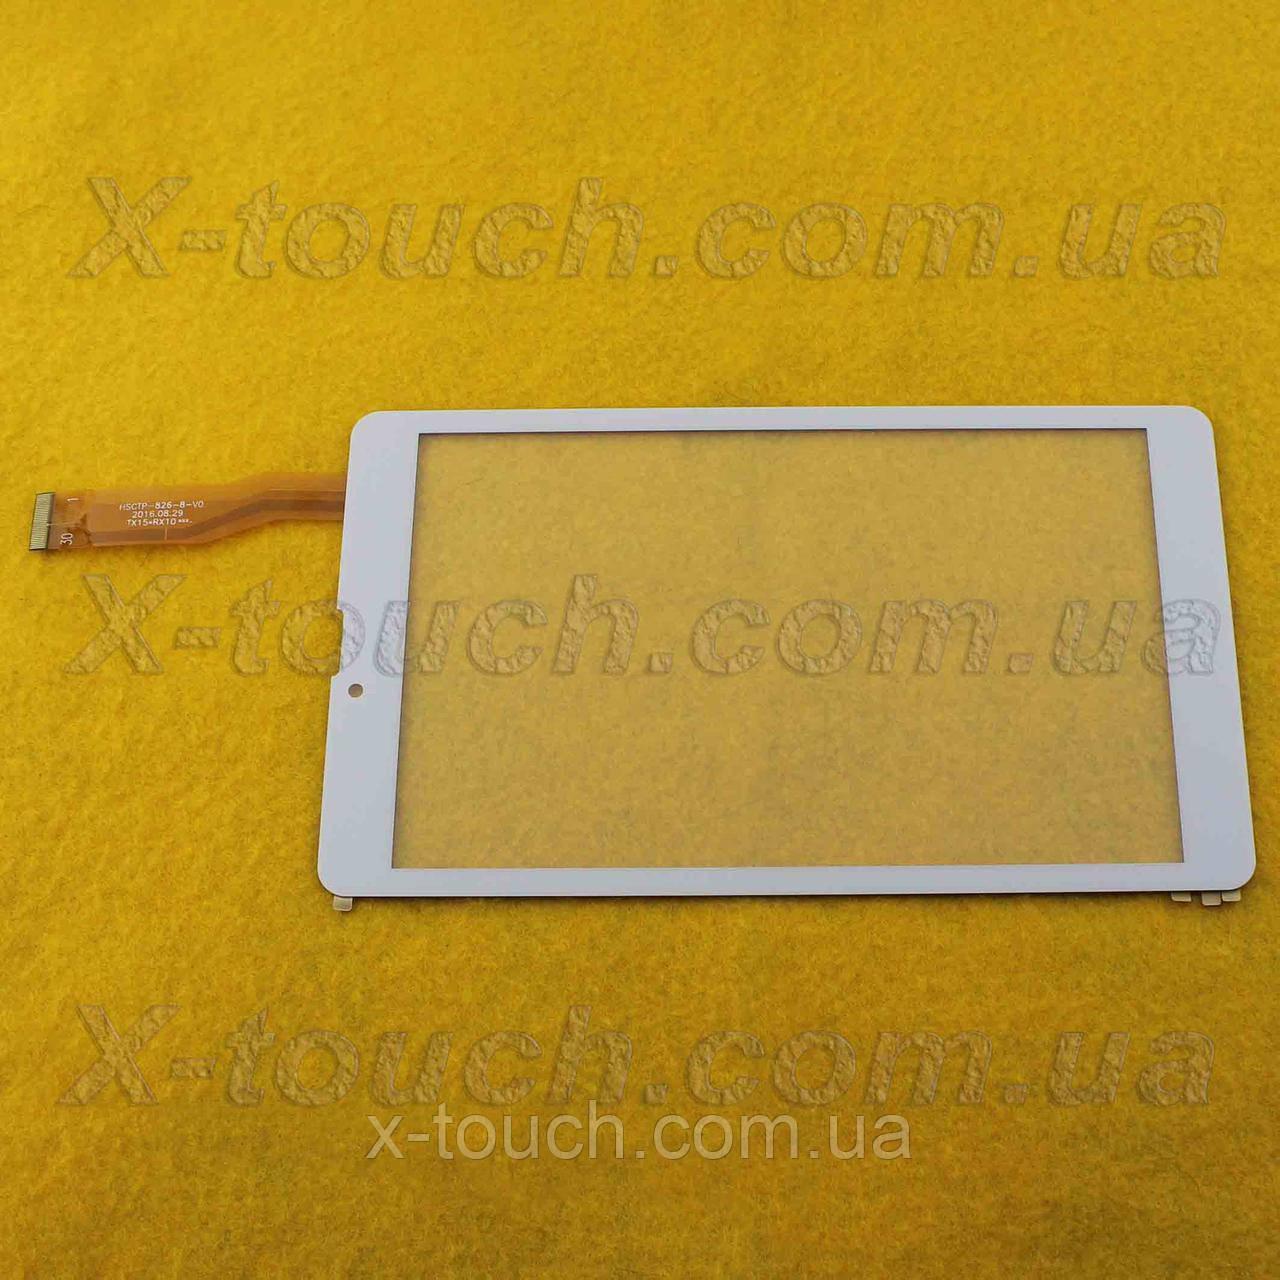 Тачскрін, сенсор HSCTP-826-8-V0 для планшета, білого кольору